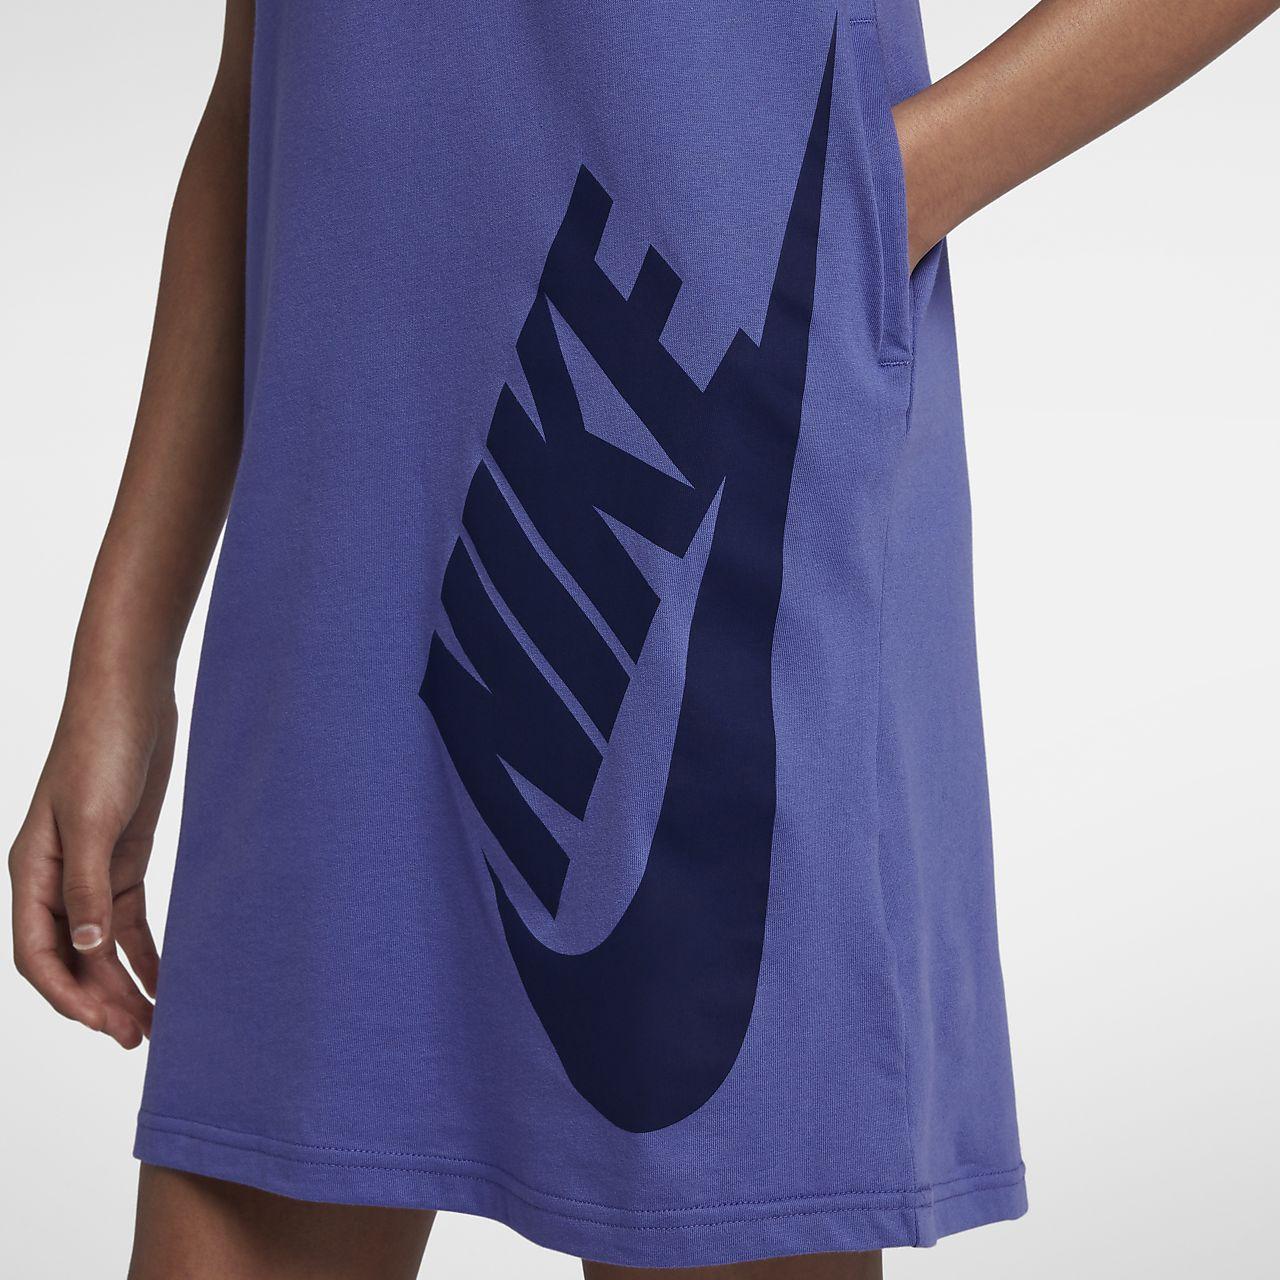 Nike Sportswear Big Kids Girls T Shirt Dress Nike